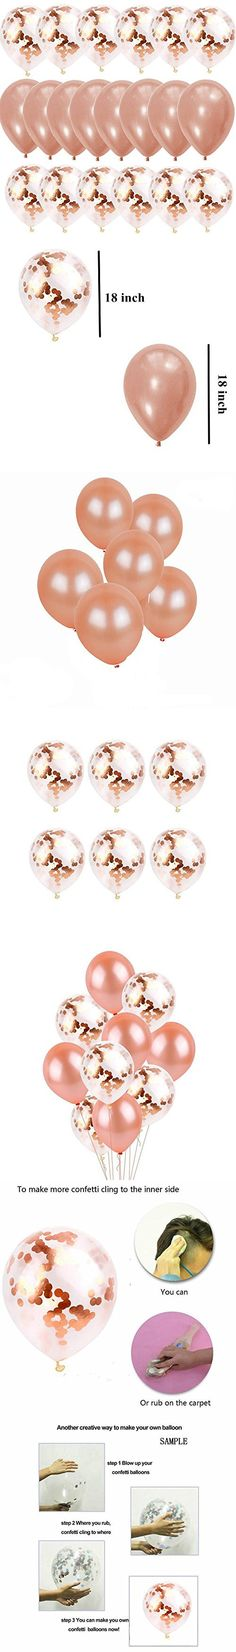 Gold Confetti Balloons Birthday Wedding 50 Pcs 12 Inch Golden Helium Latex Plastic Dots Glitter Balloon Bulk for Party Decorations Baby Kids Girl Women Graduation Set 6